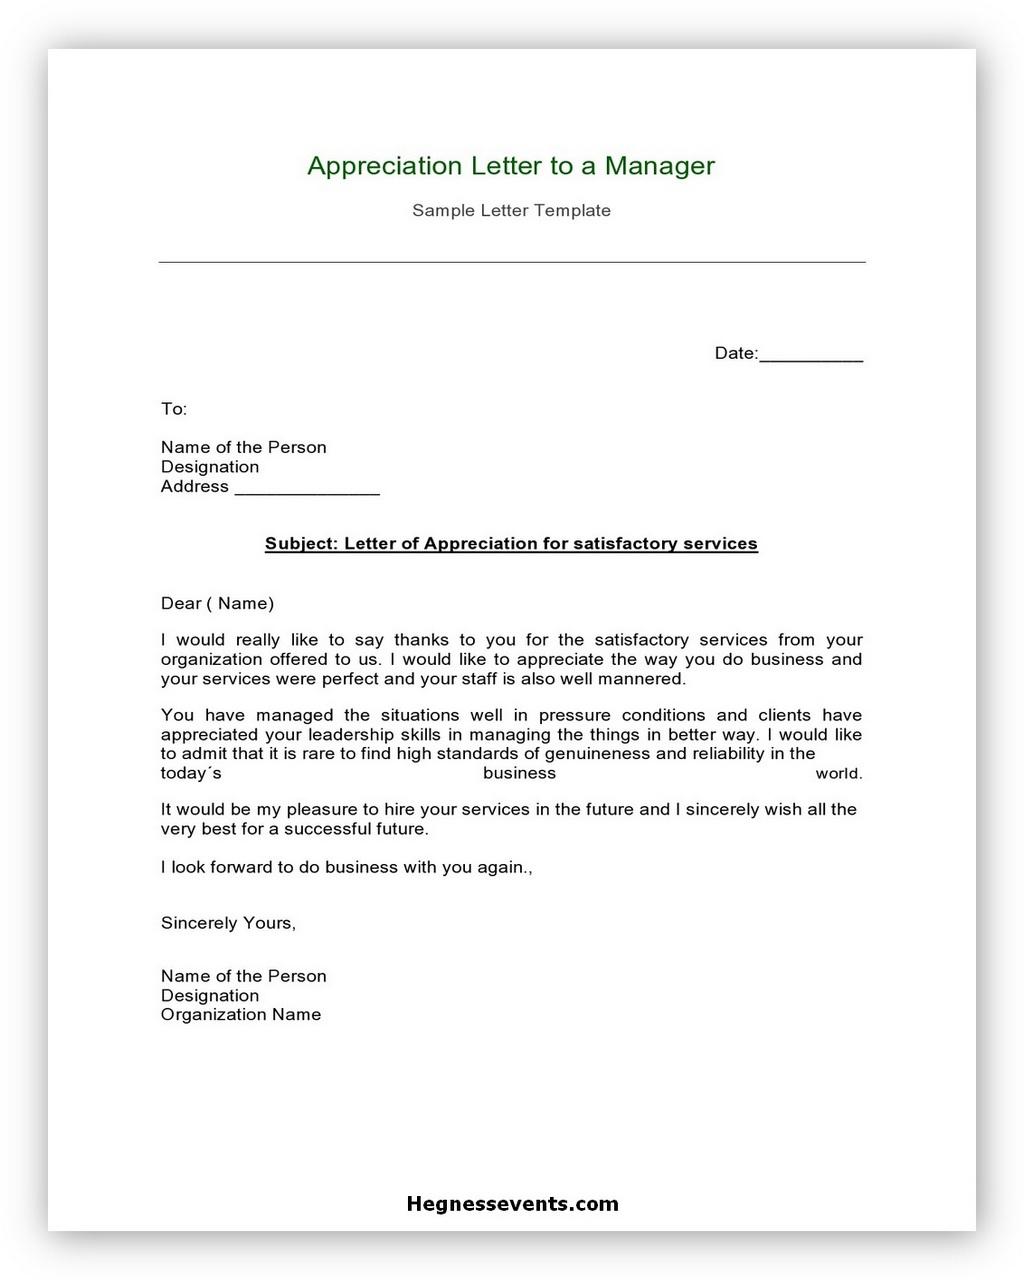 Appreciation Letter Example 02